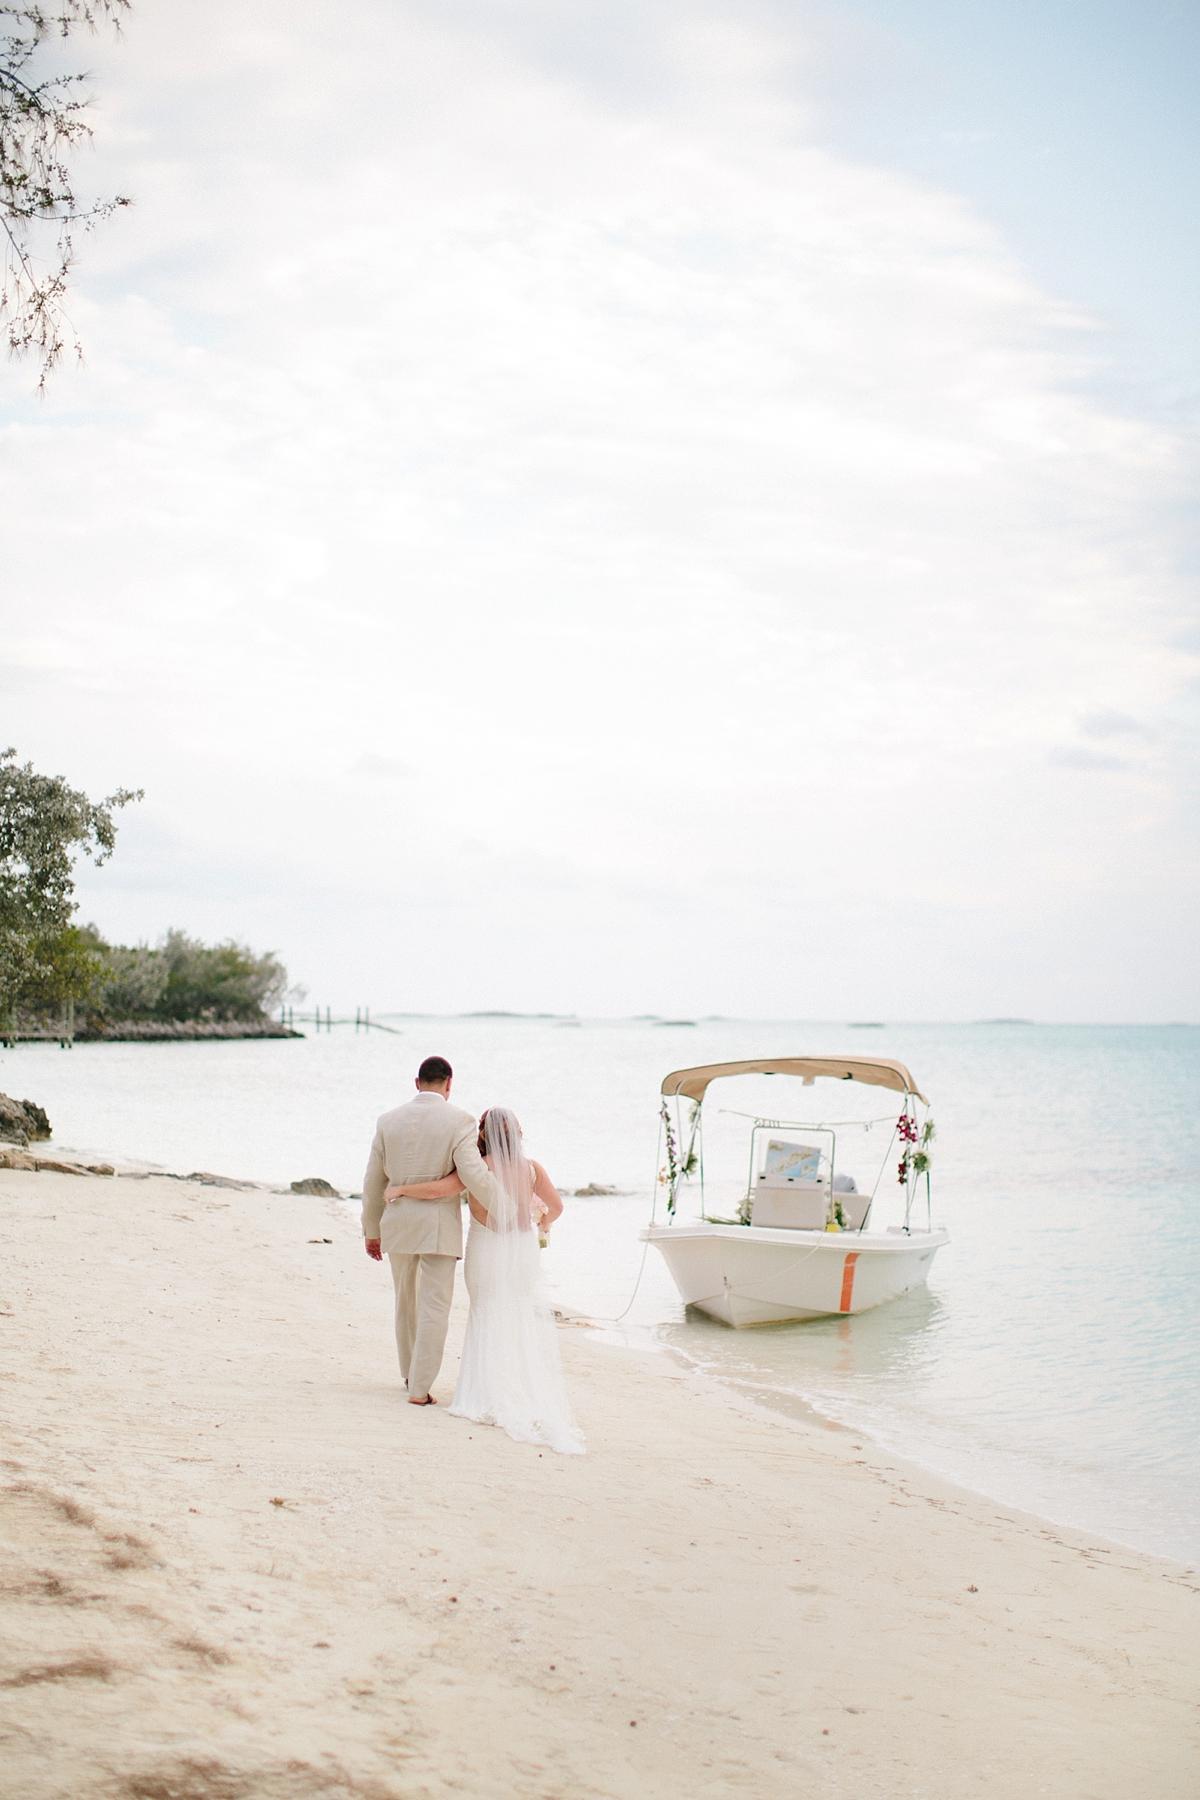 bahamas-destination-wedding-photographer-island-private-ceremony-staniel-cay_0030.jpg